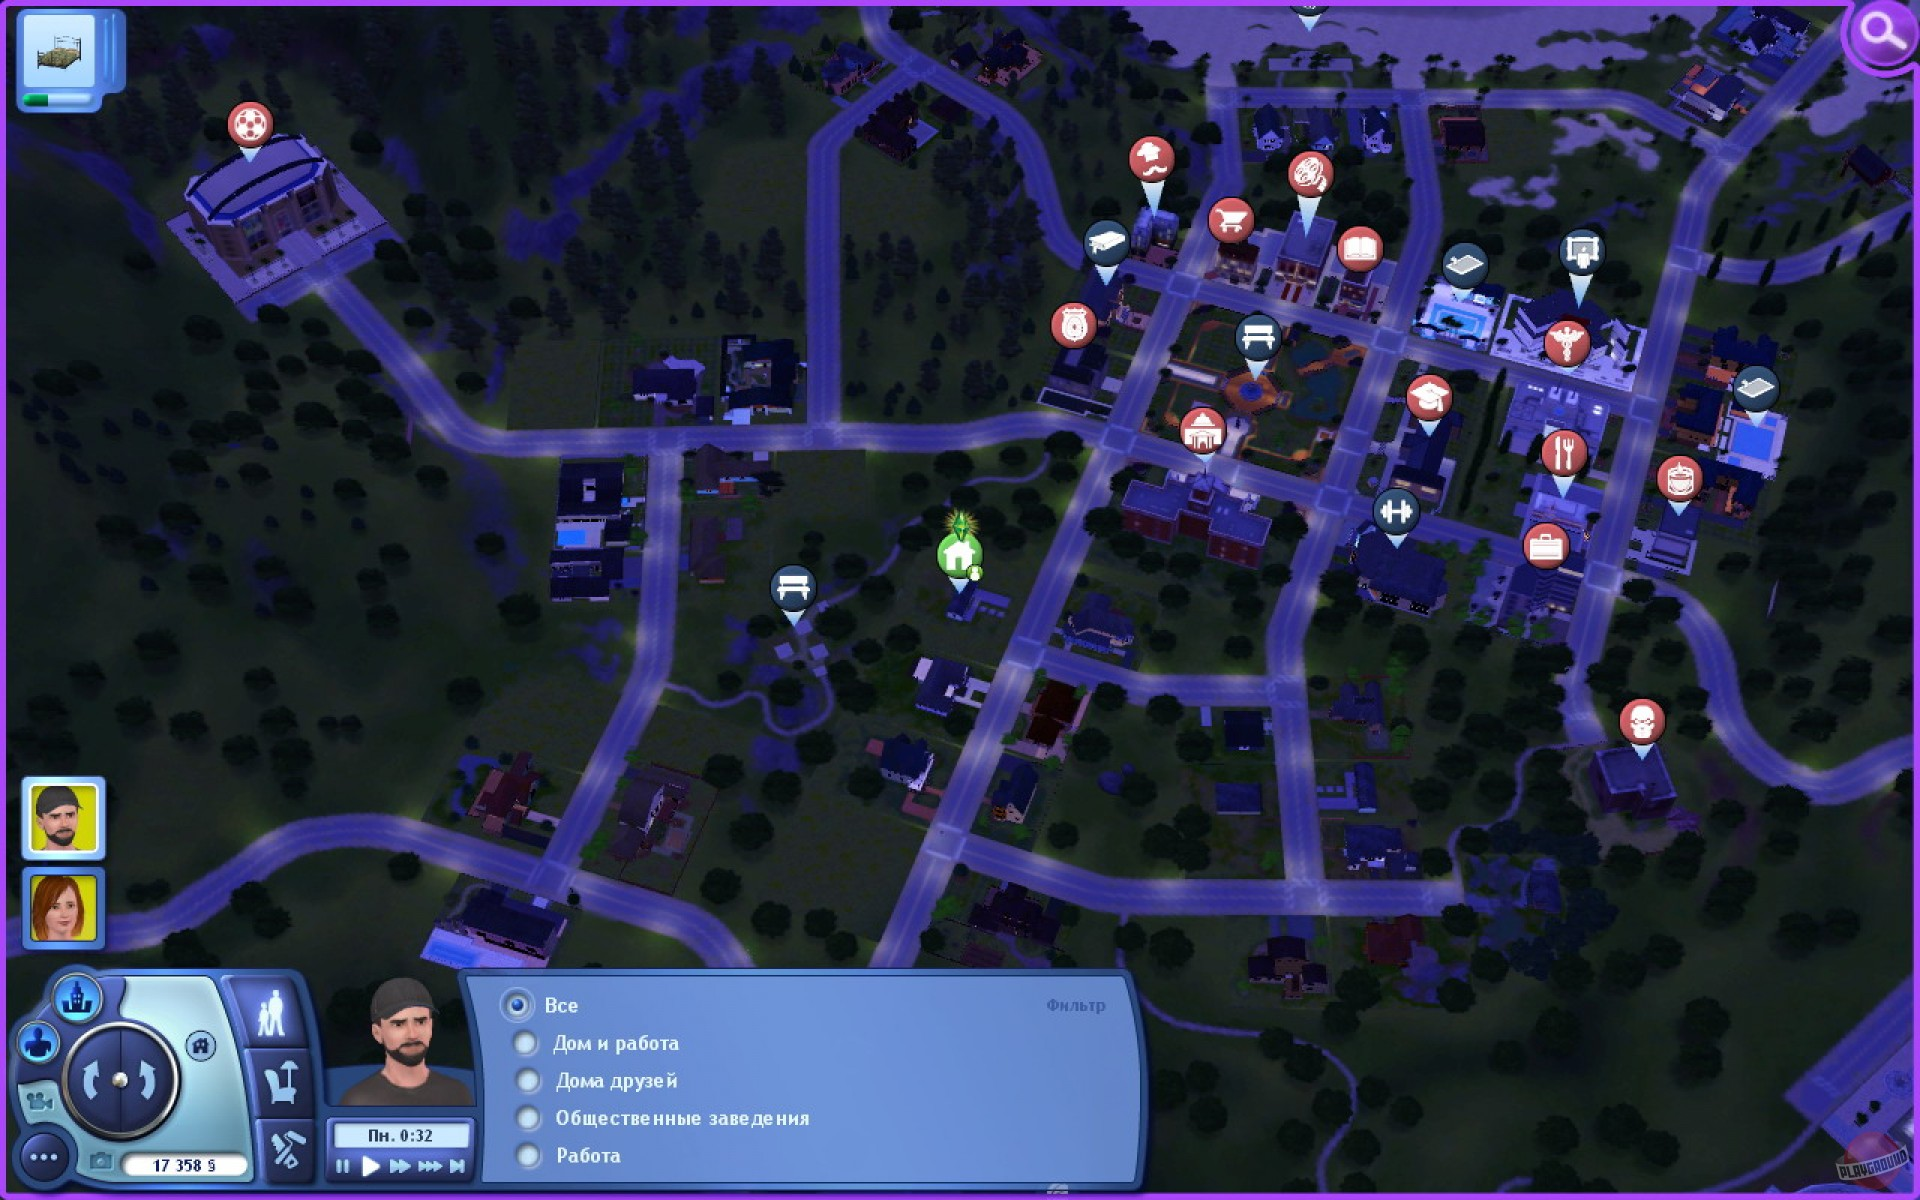 Sims 3 xx hentia scenes